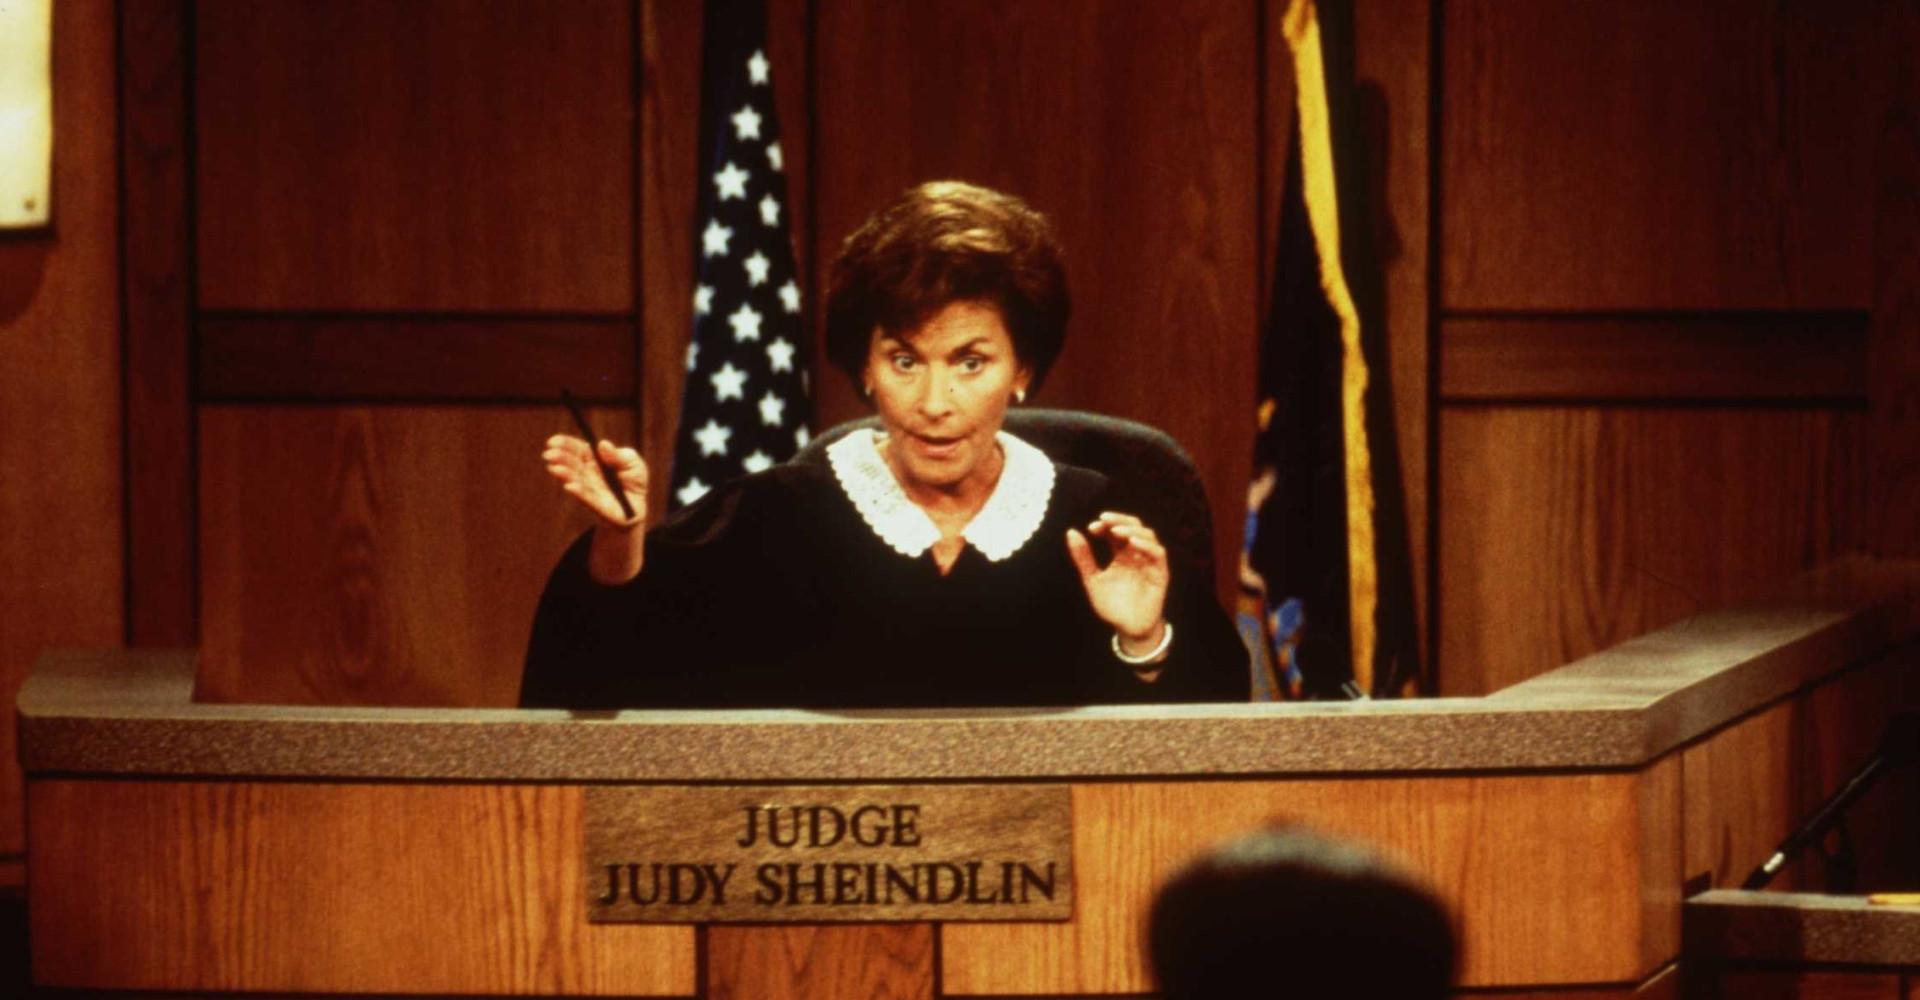 Judge Judy's astounding new mansion reveals her true wealth